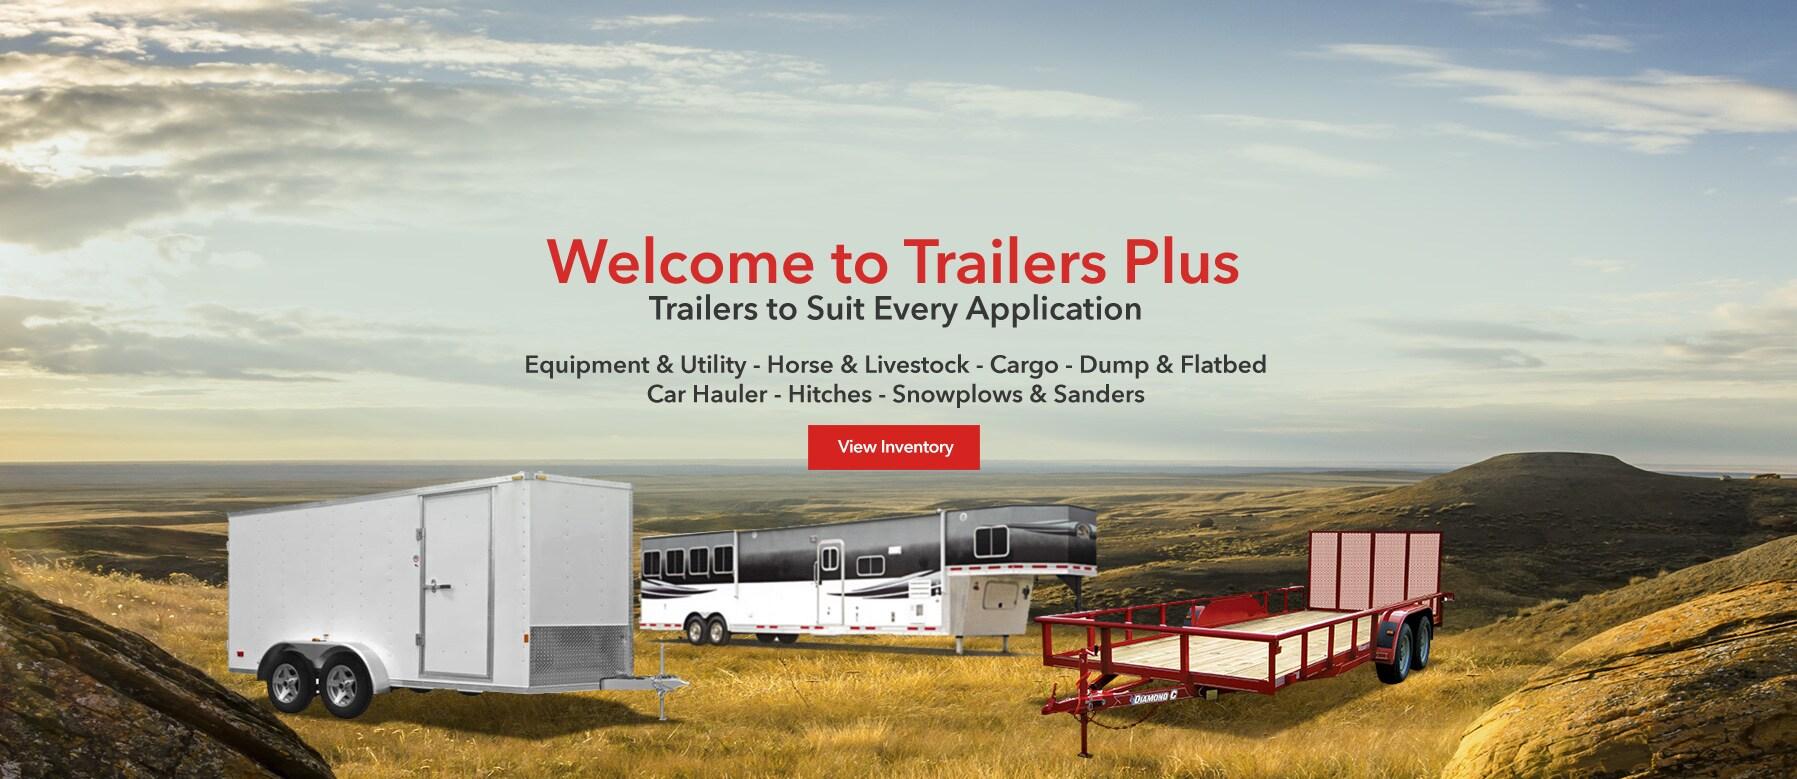 Trailers Plus Peterborough >> Trailers Plus: Trailer Dealership Peterborough ON | Near ...